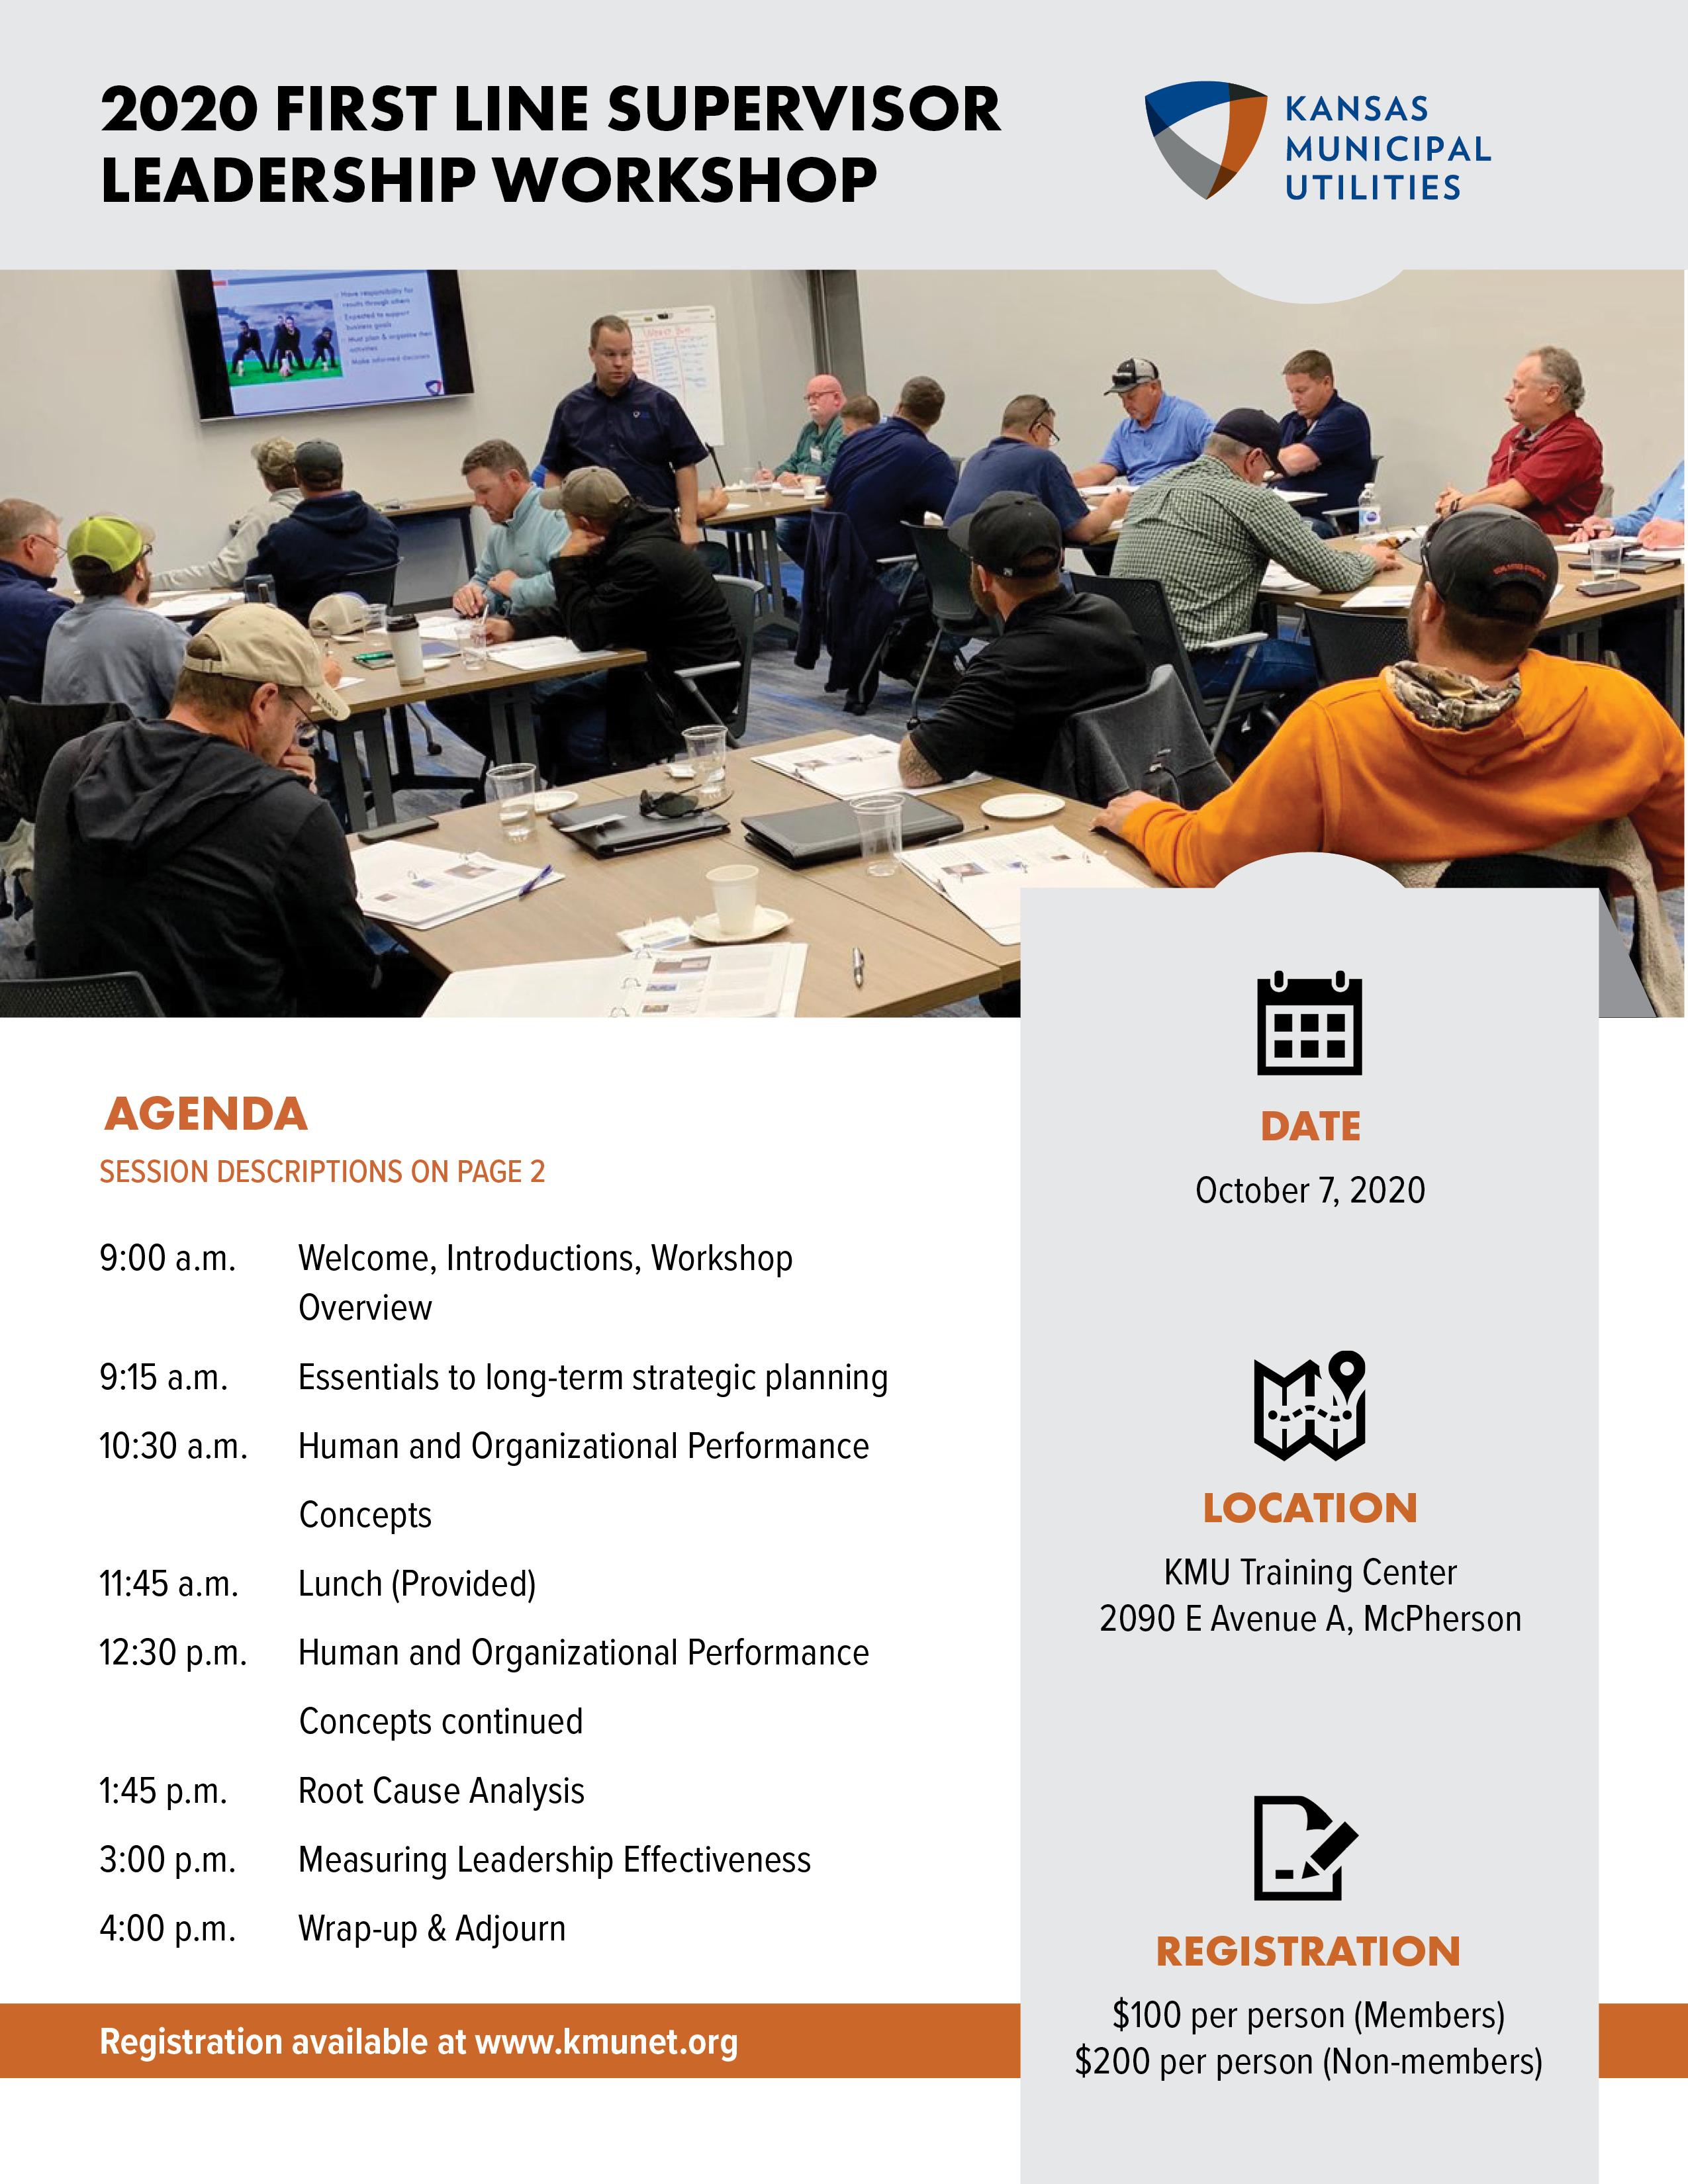 2020 Supervisor Leadership Seminar - Kansas Municipal Utilities